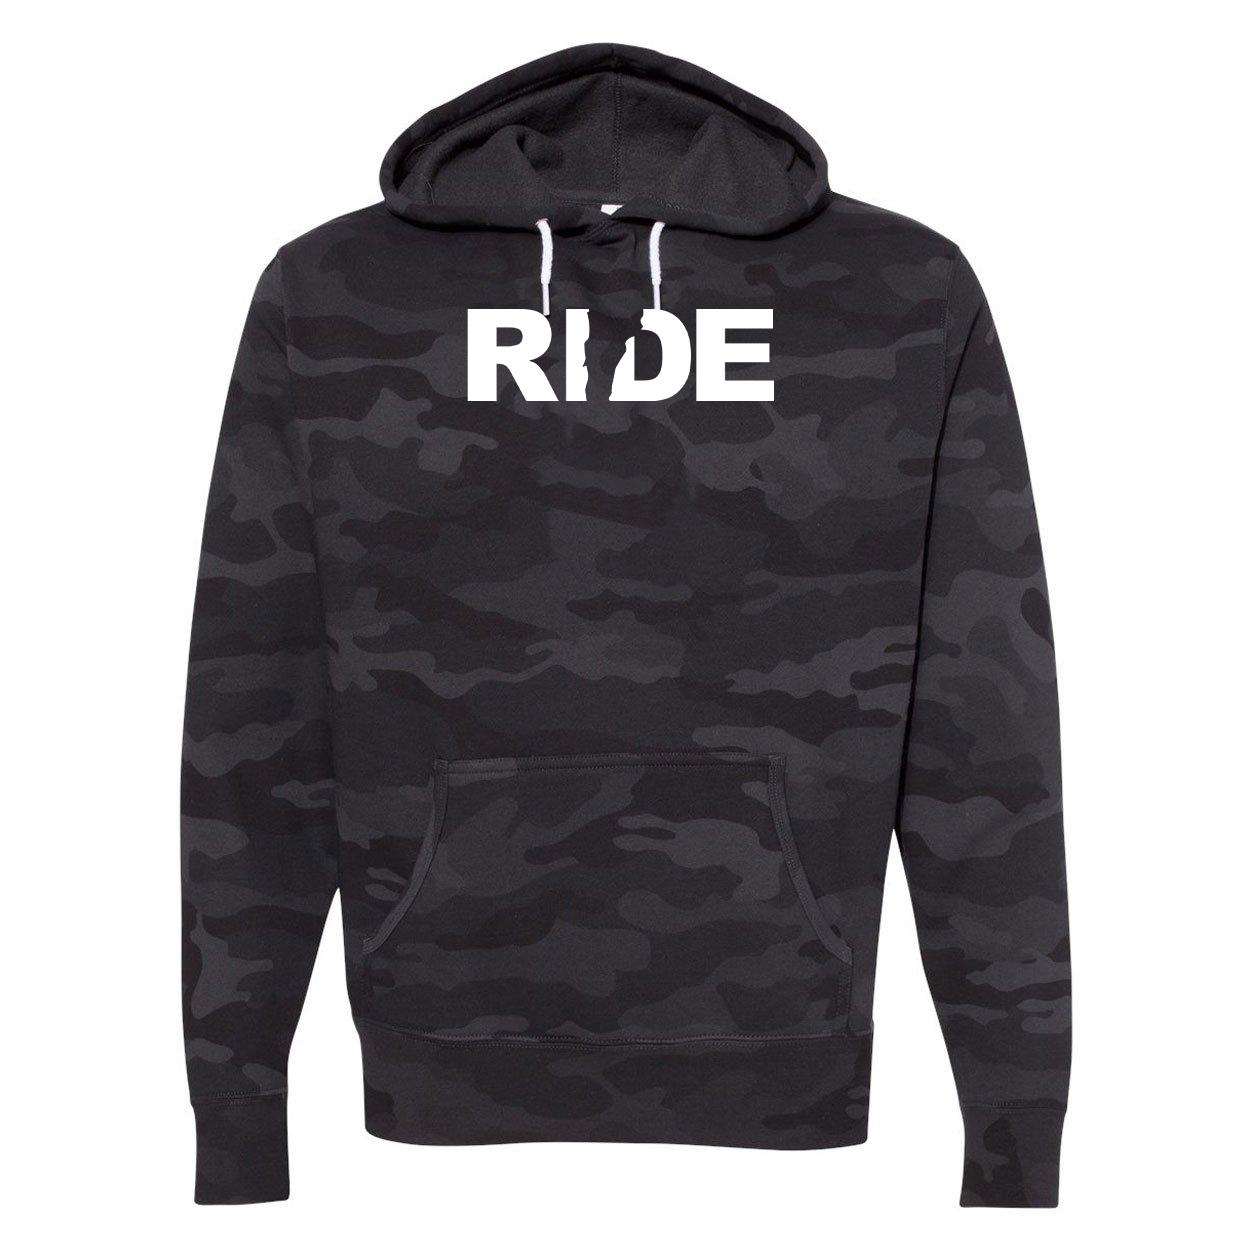 Ride Vermont Classic Unisex Hooded Sweatshirt Black Camo (White Logo)